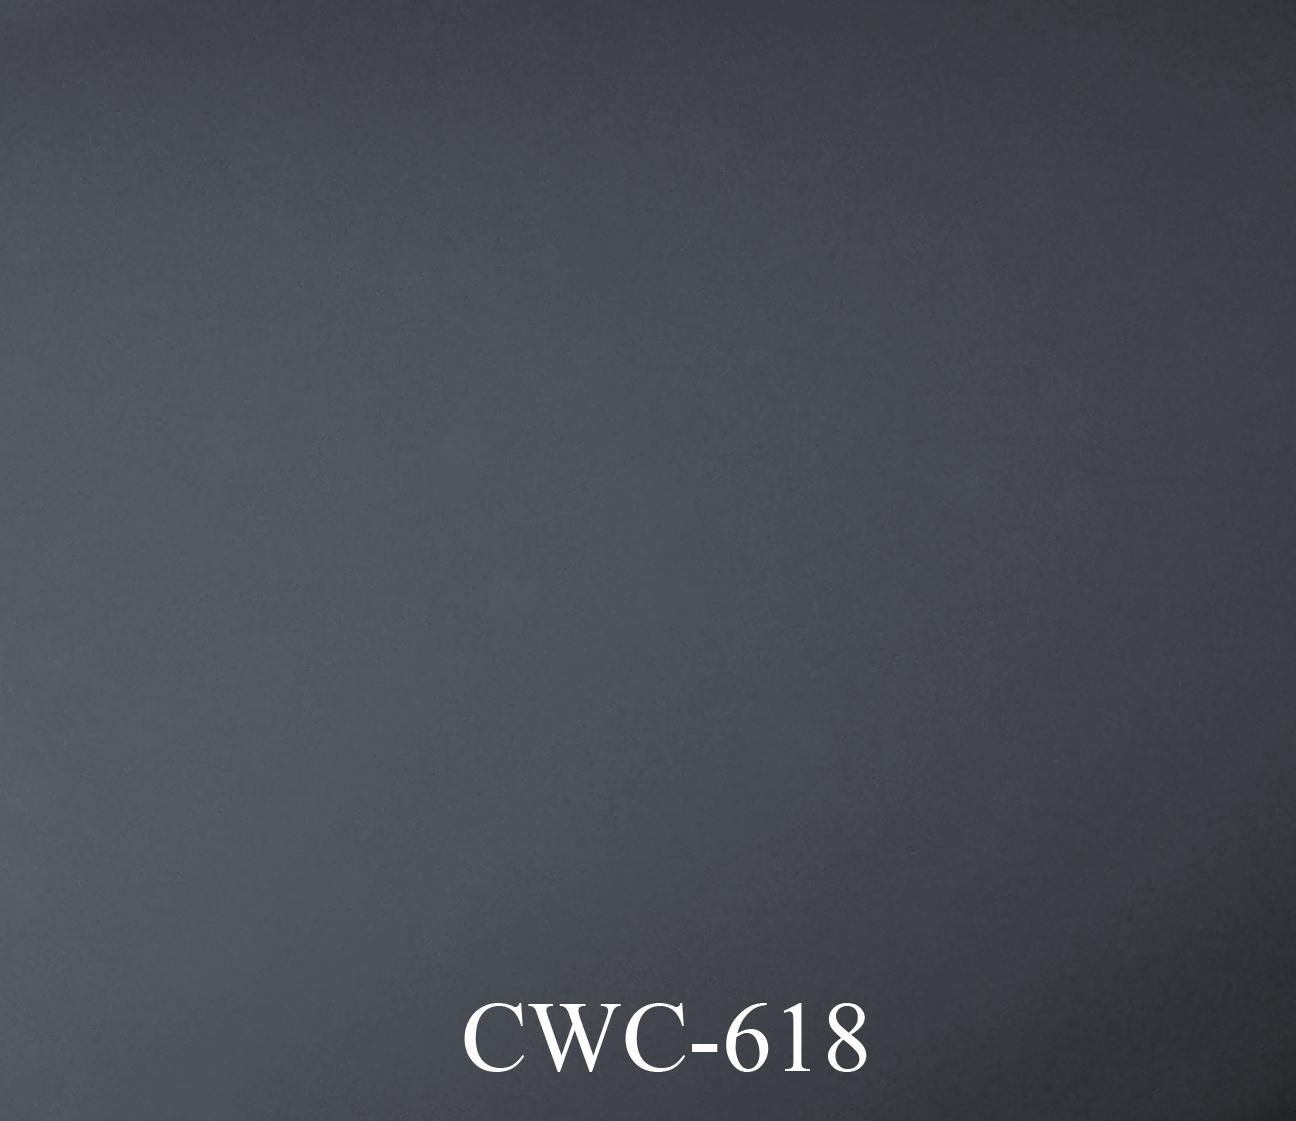 Gunpowder grau metallic matt usa 4 d autofolien von arlon for Klebefolie grau matt